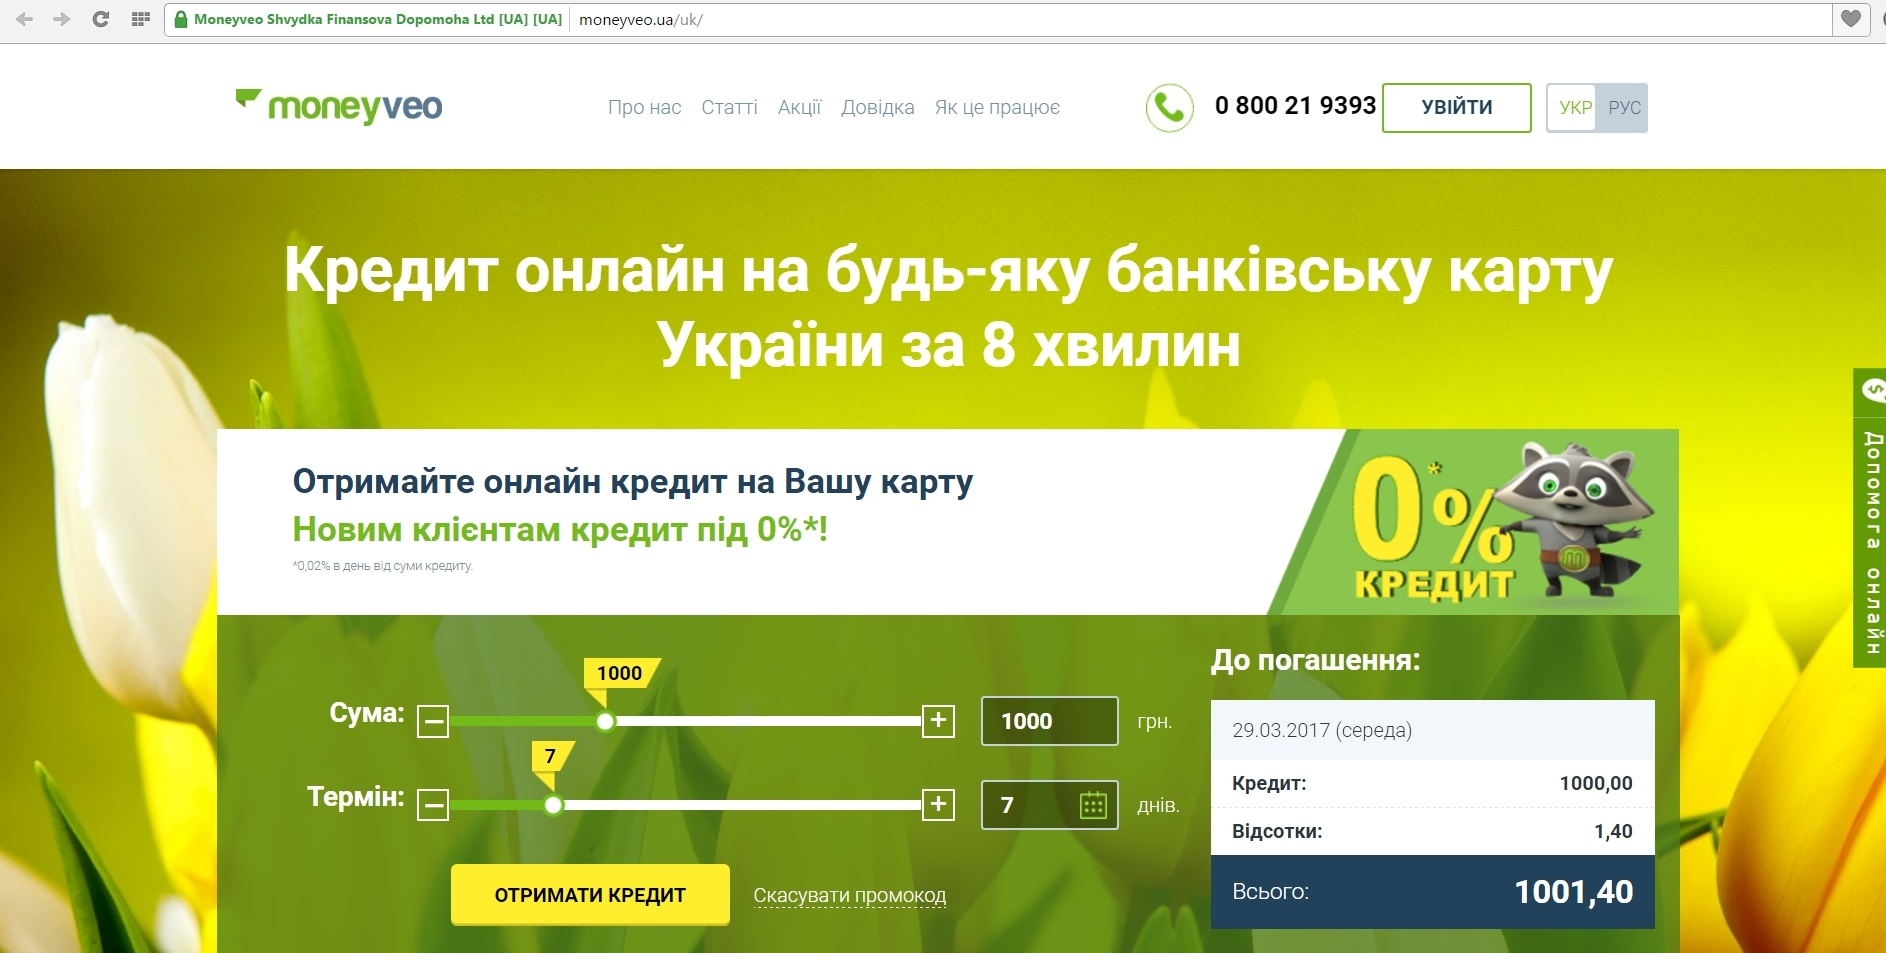 Компания Moneyveo